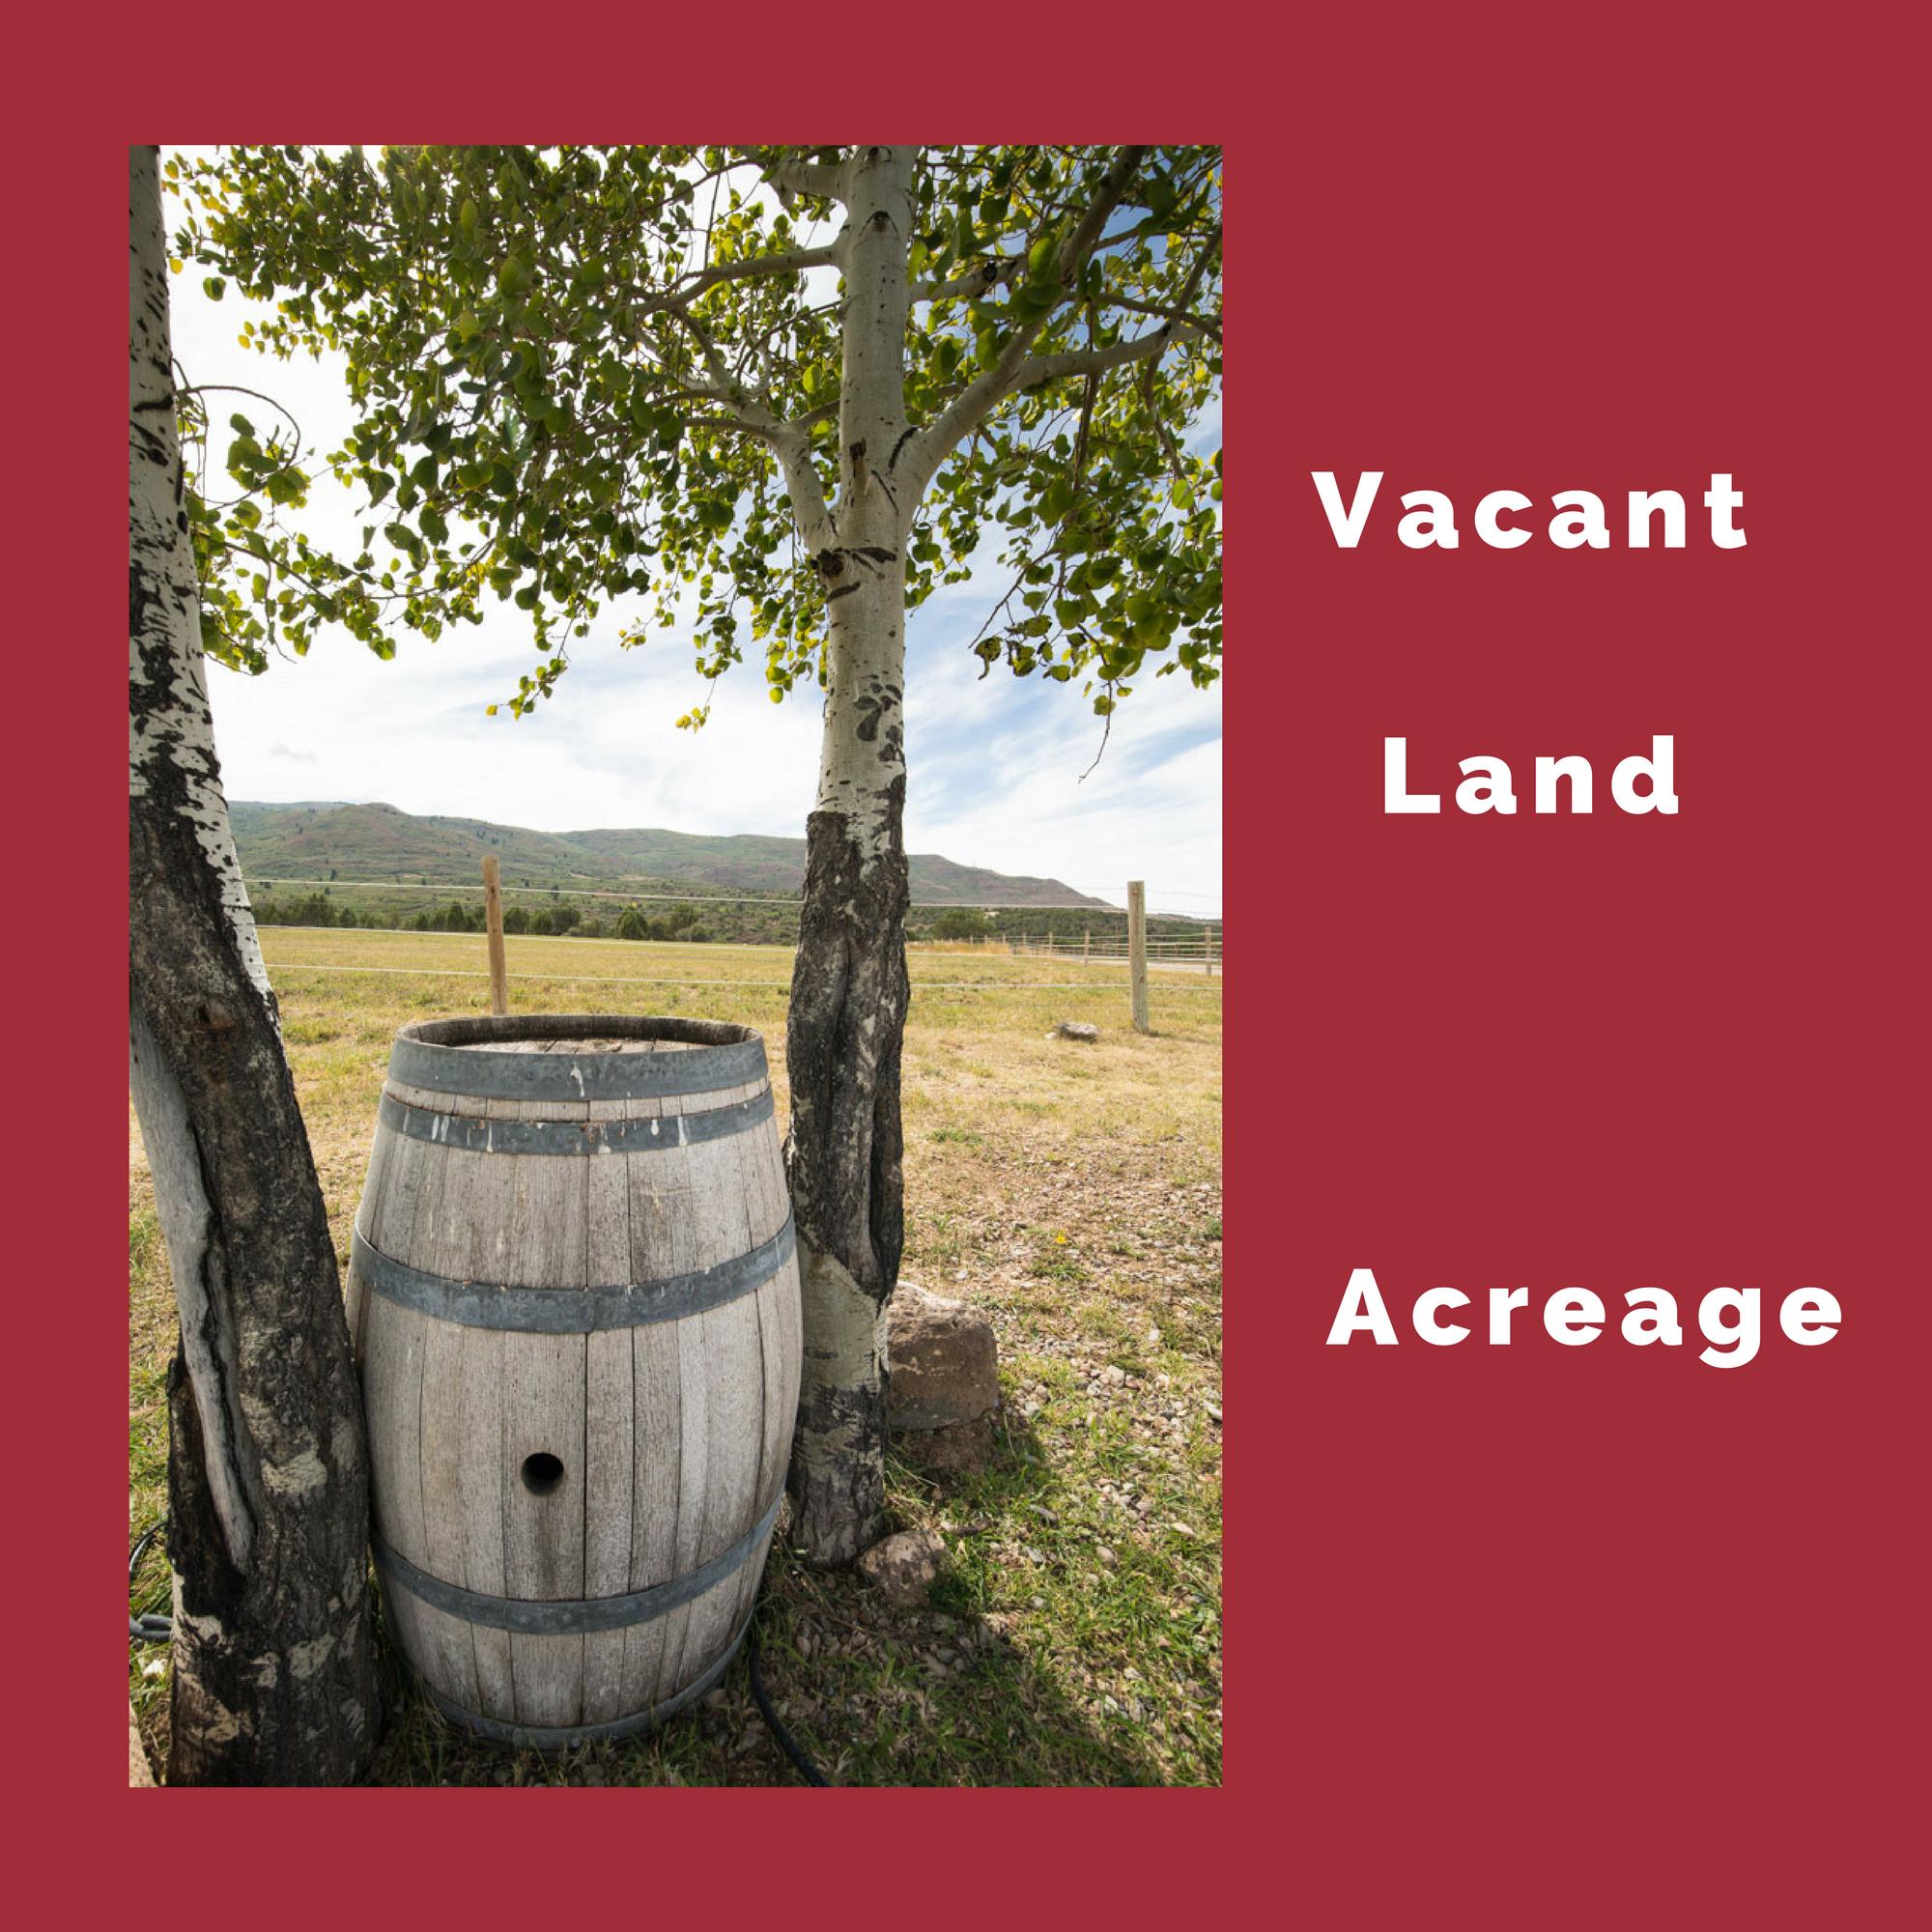 Vacant Land Acreage